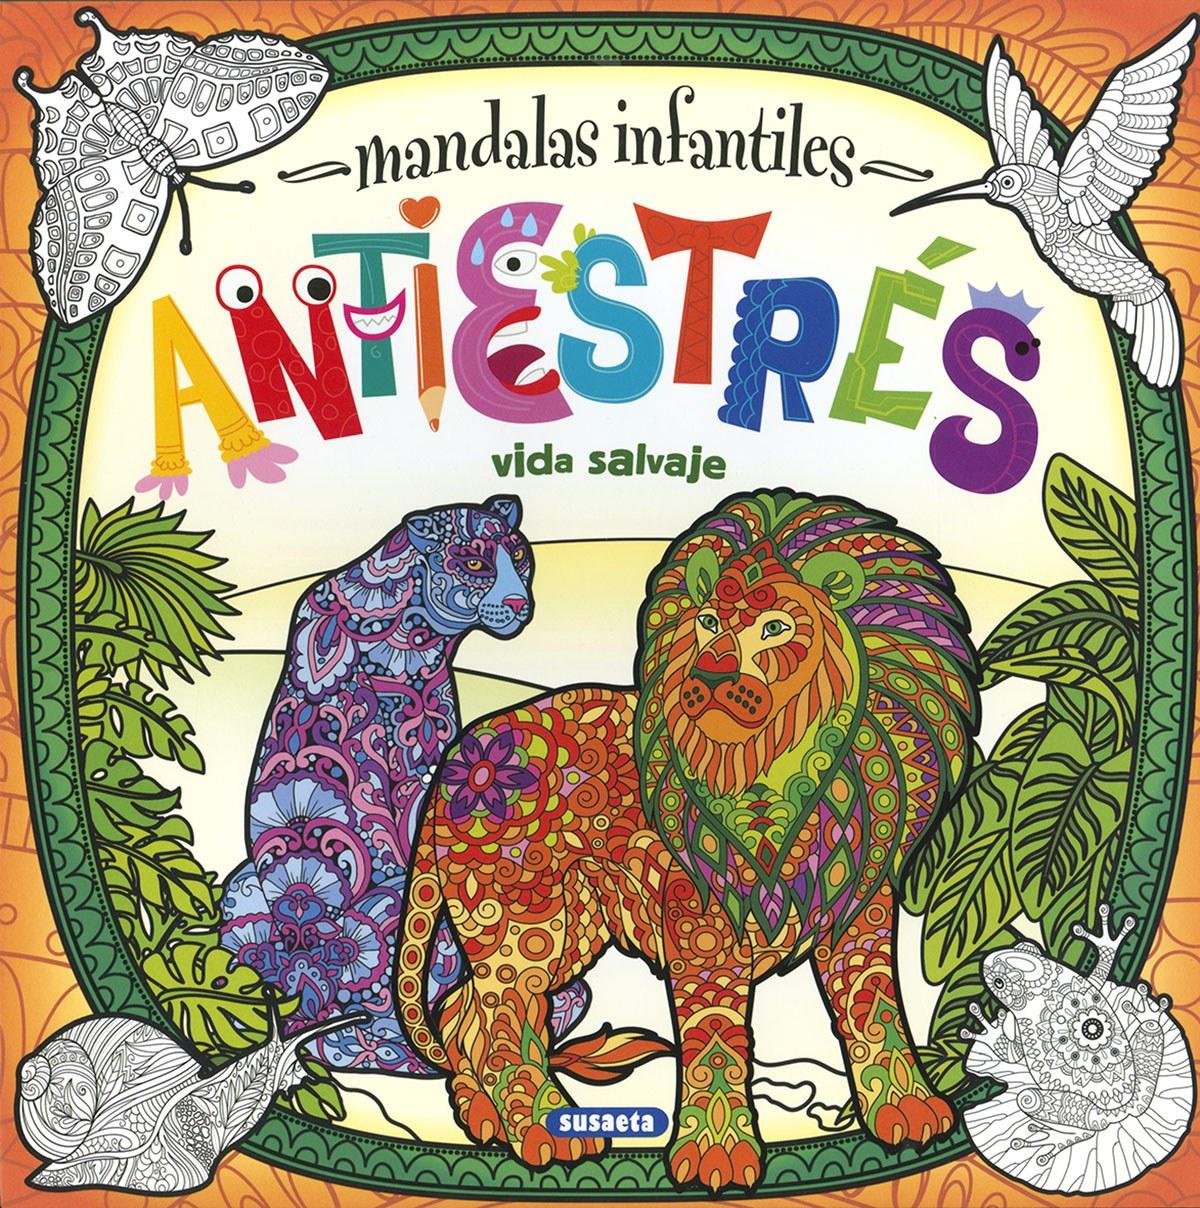 MANDALES INFANTILES - ANTIESTRES - VIDA SALVAJE 9788467774498